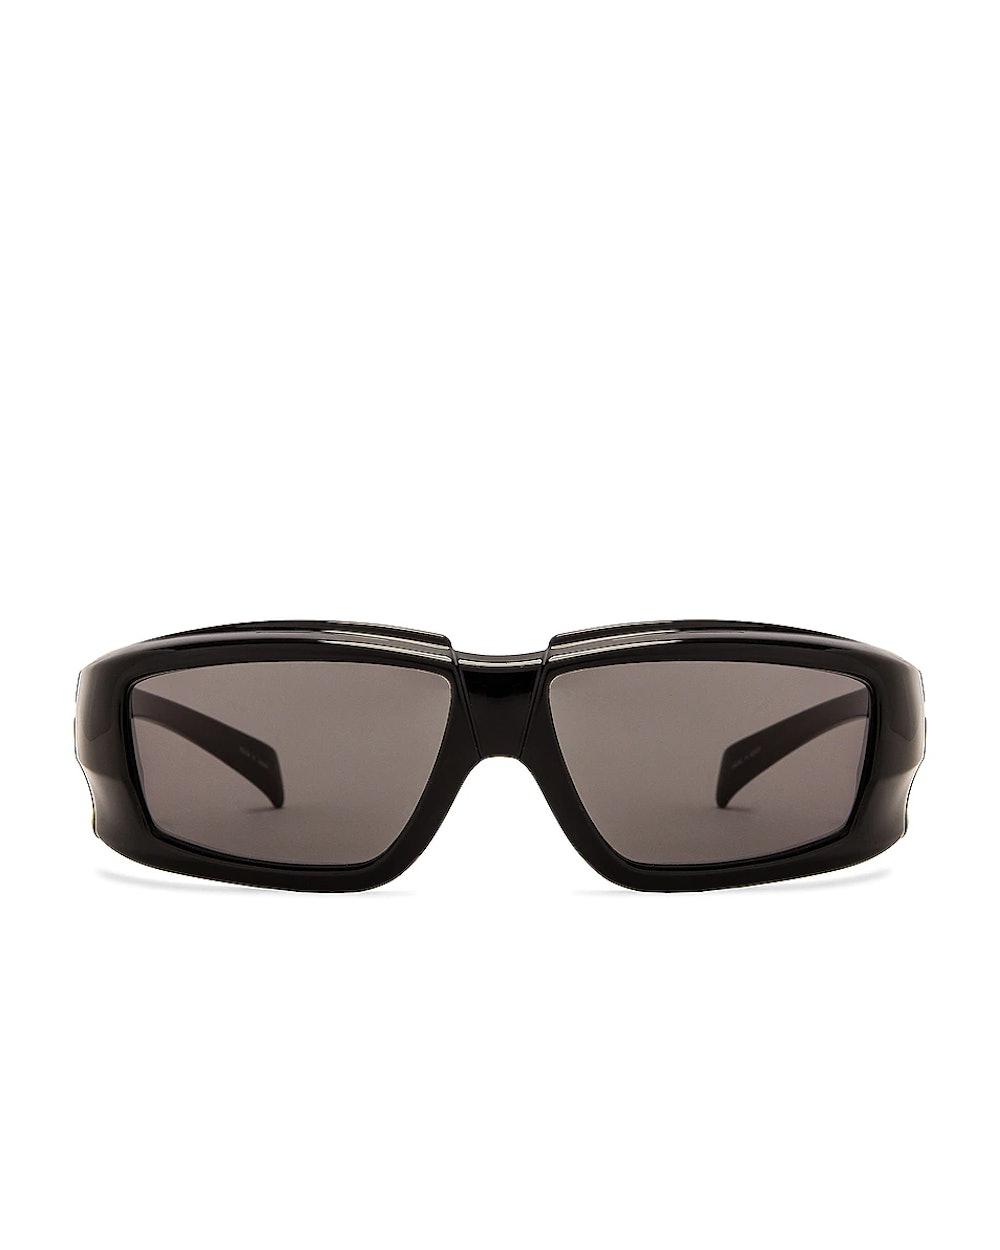 Rick Sunglasses